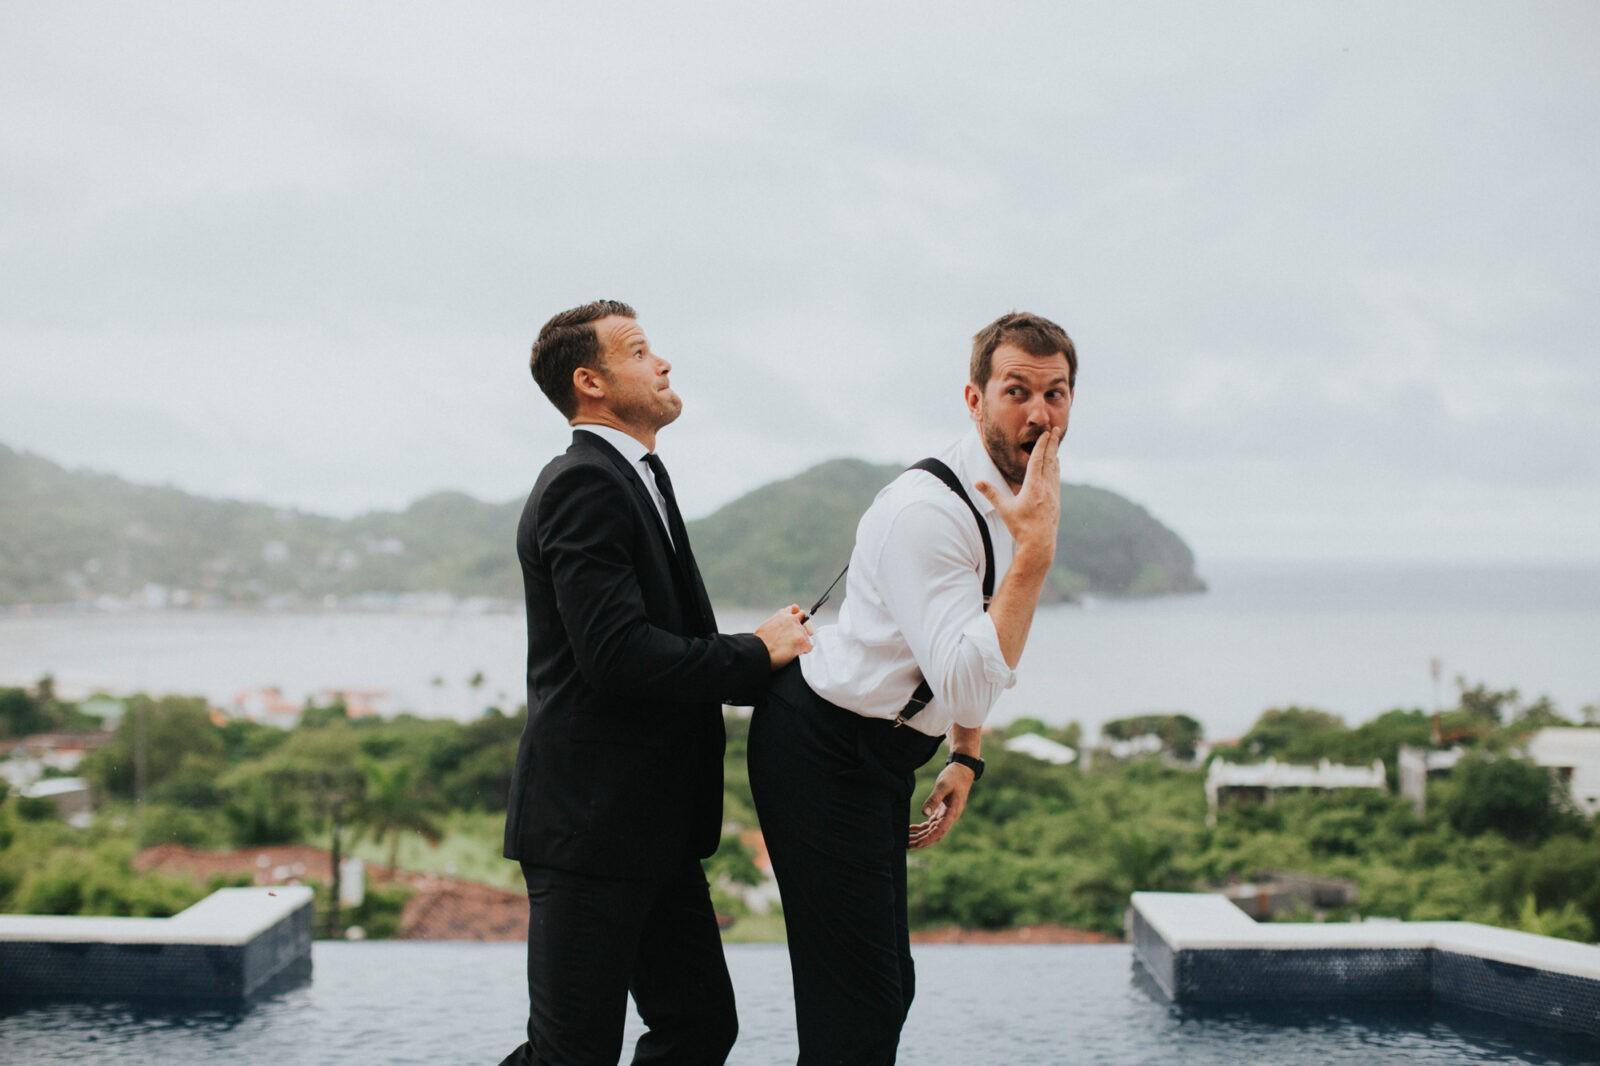 funny groomsmen portraits